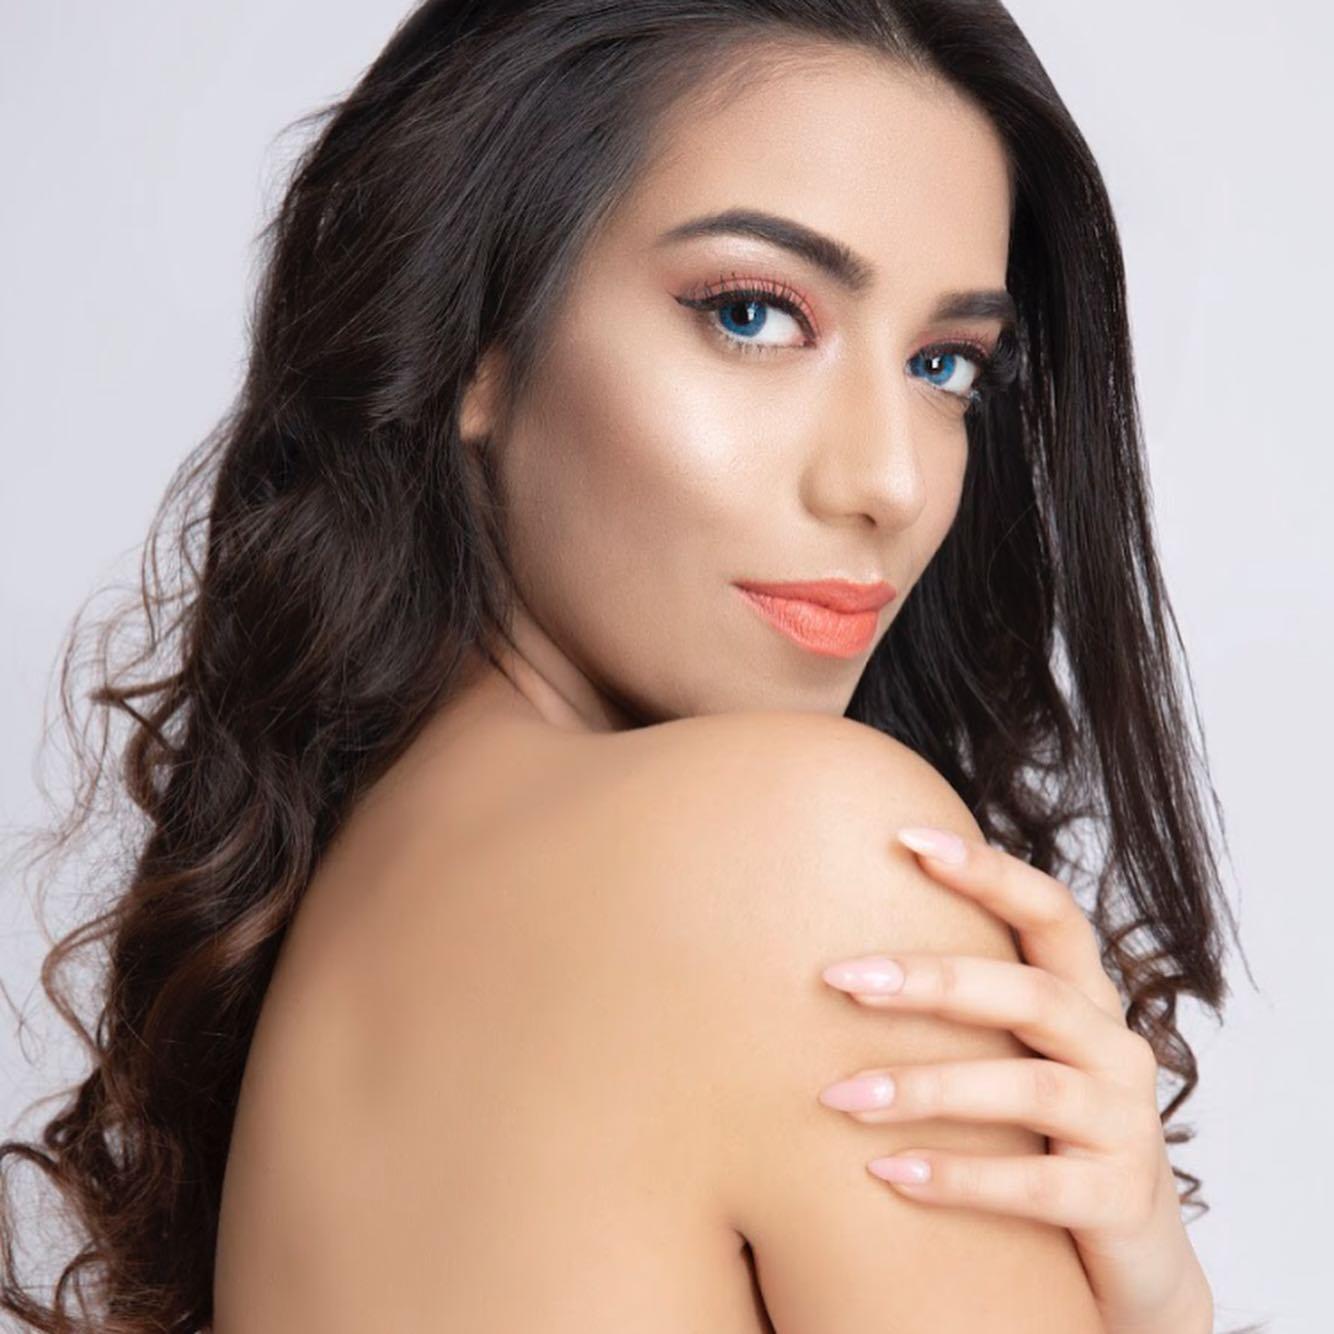 Aina Qureshi, Rawalpindi girl, is crowned Miss Pakistan World